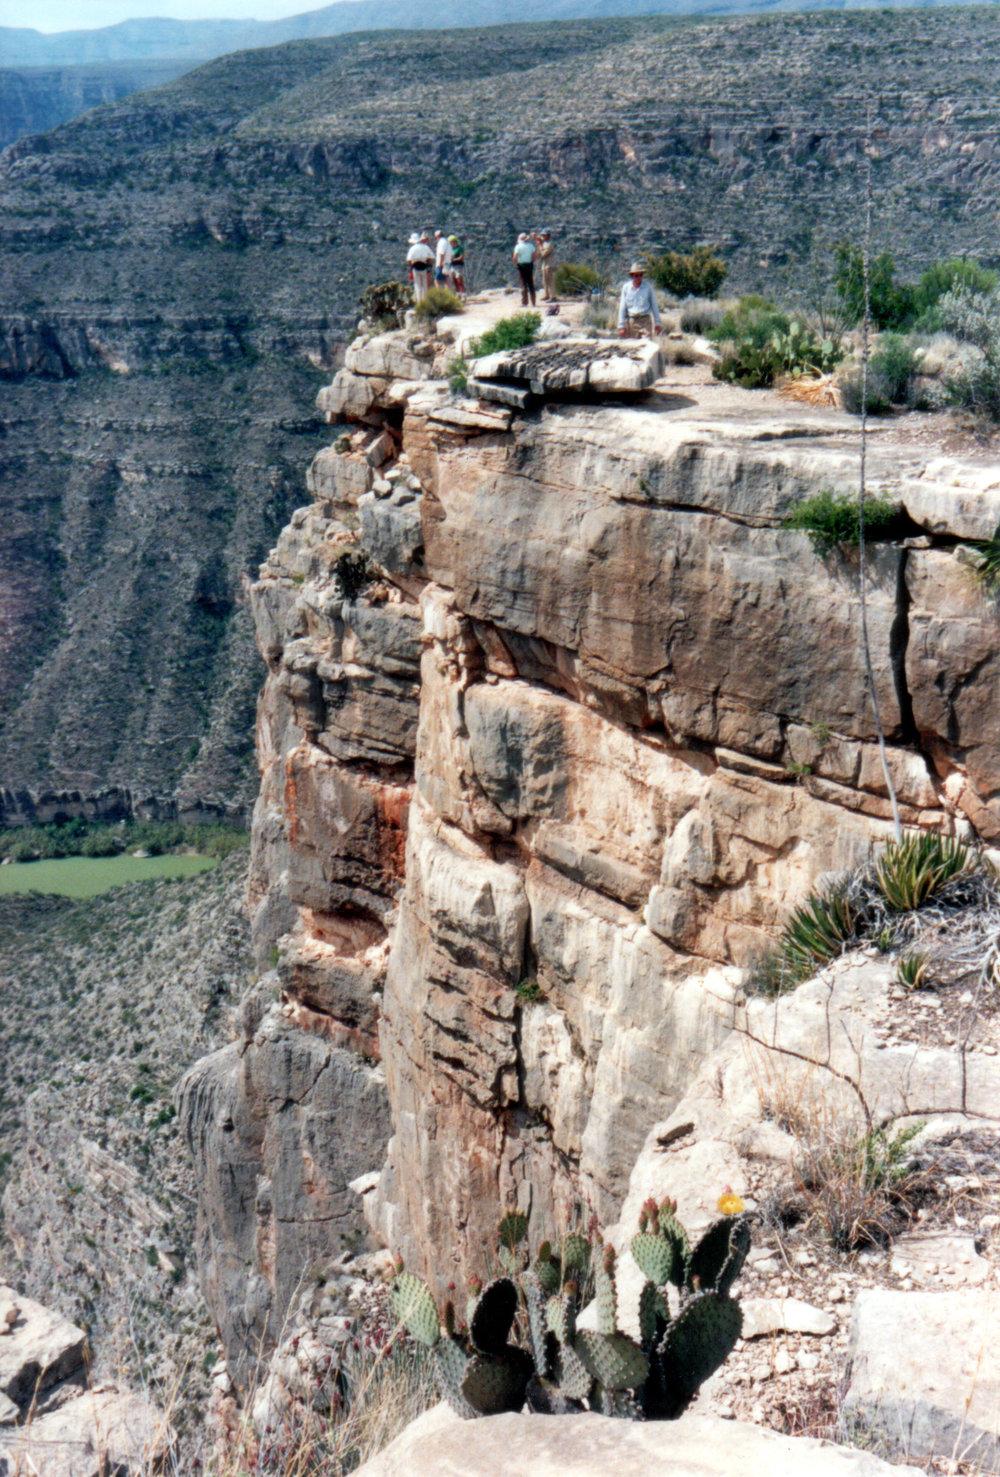 Lower Canyons - Burro Bluff